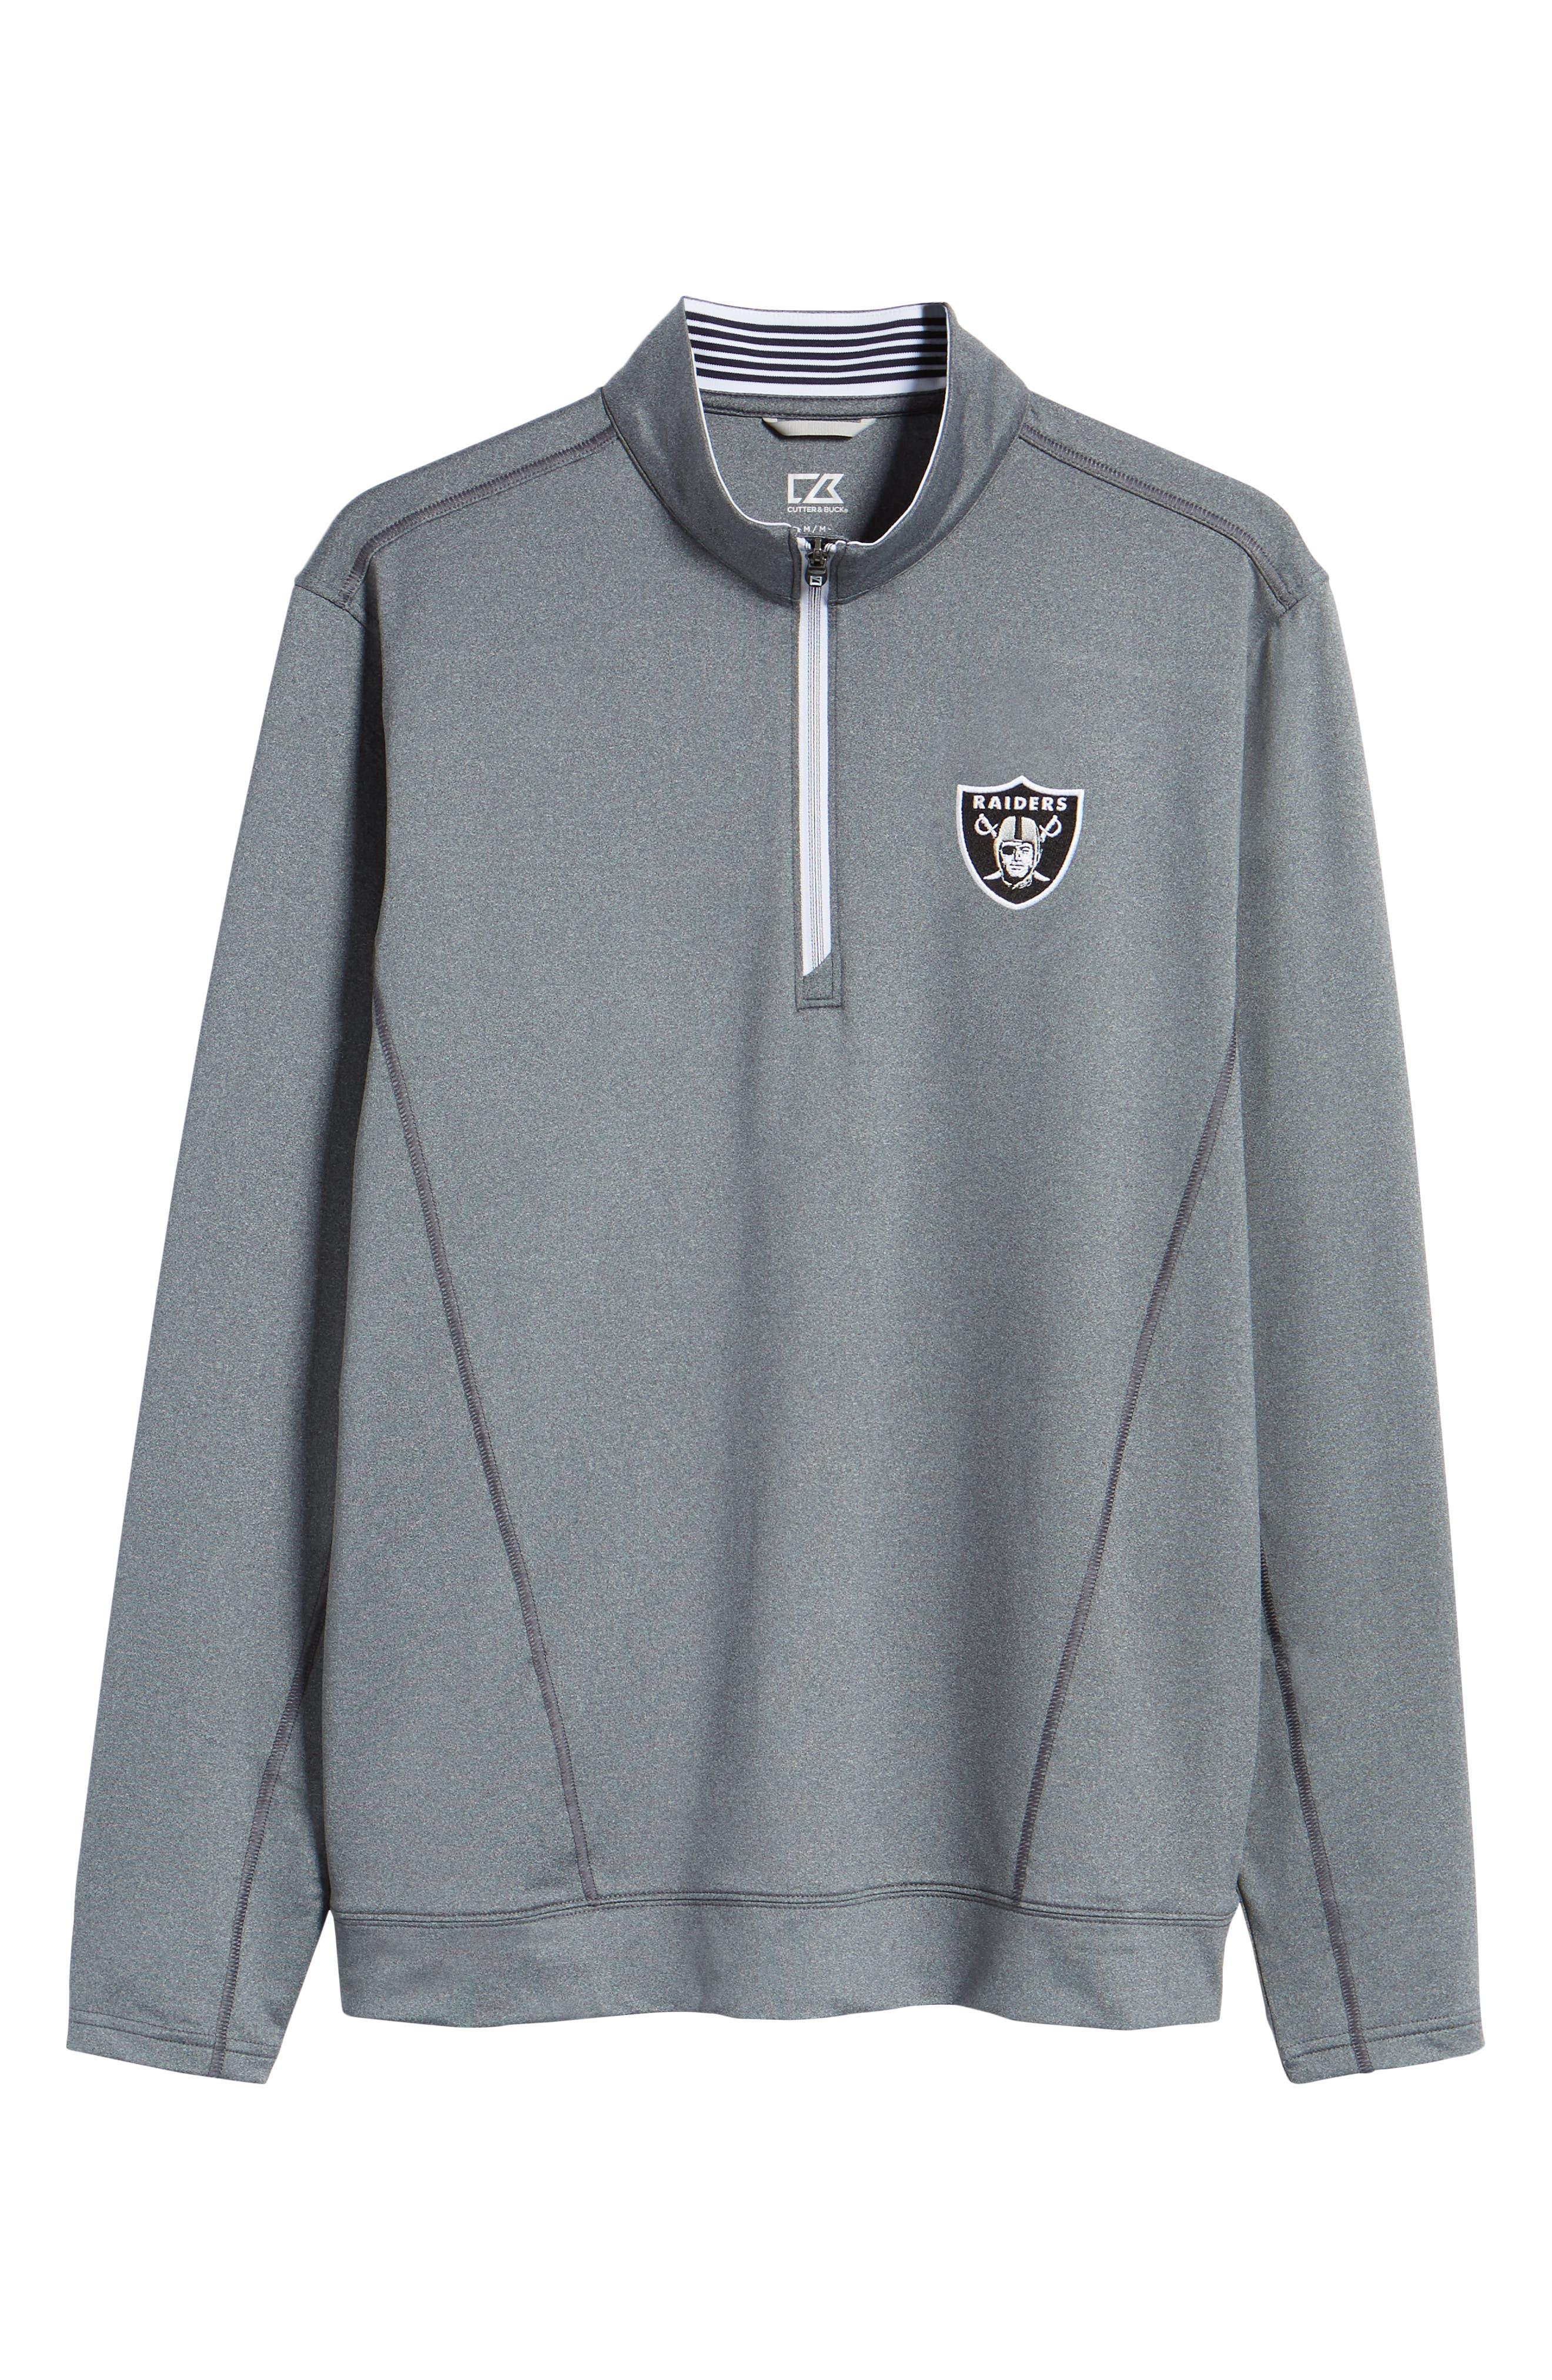 Endurance Oakland Raiders Regular Fit Pullover,                             Alternate thumbnail 6, color,                             CHARCOAL HEATHER